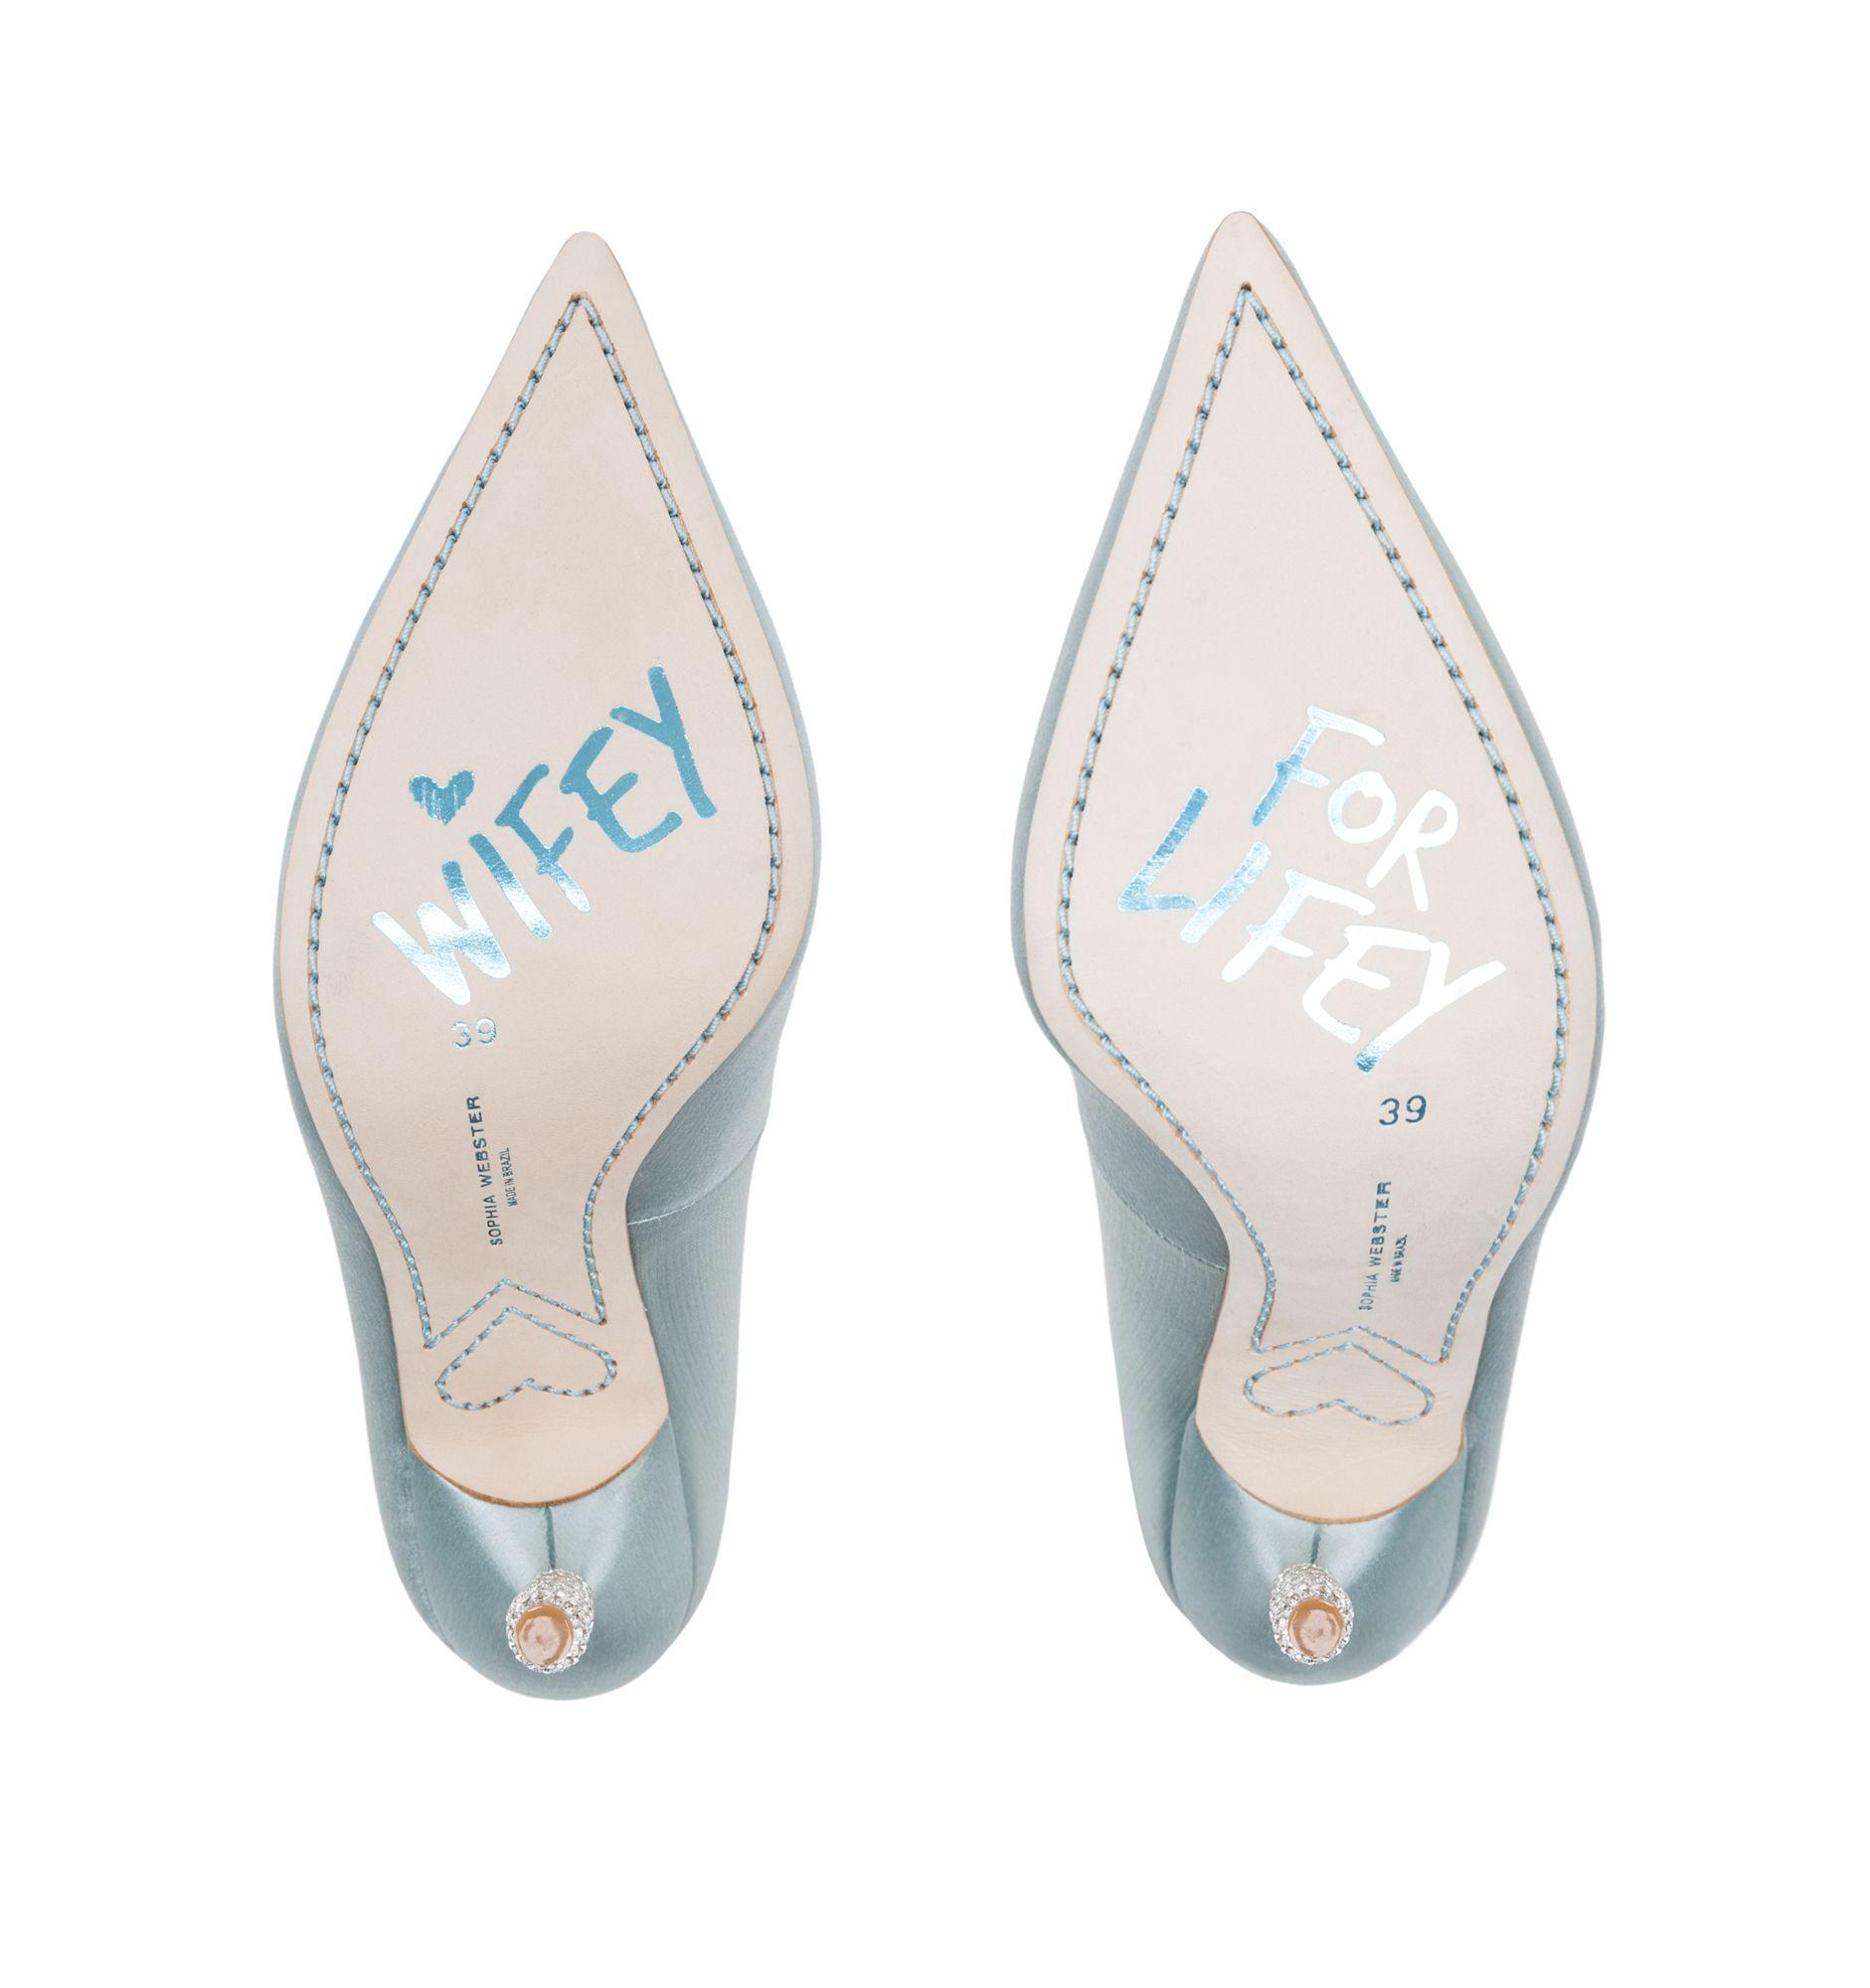 Wedding shoes by Sophia Webster